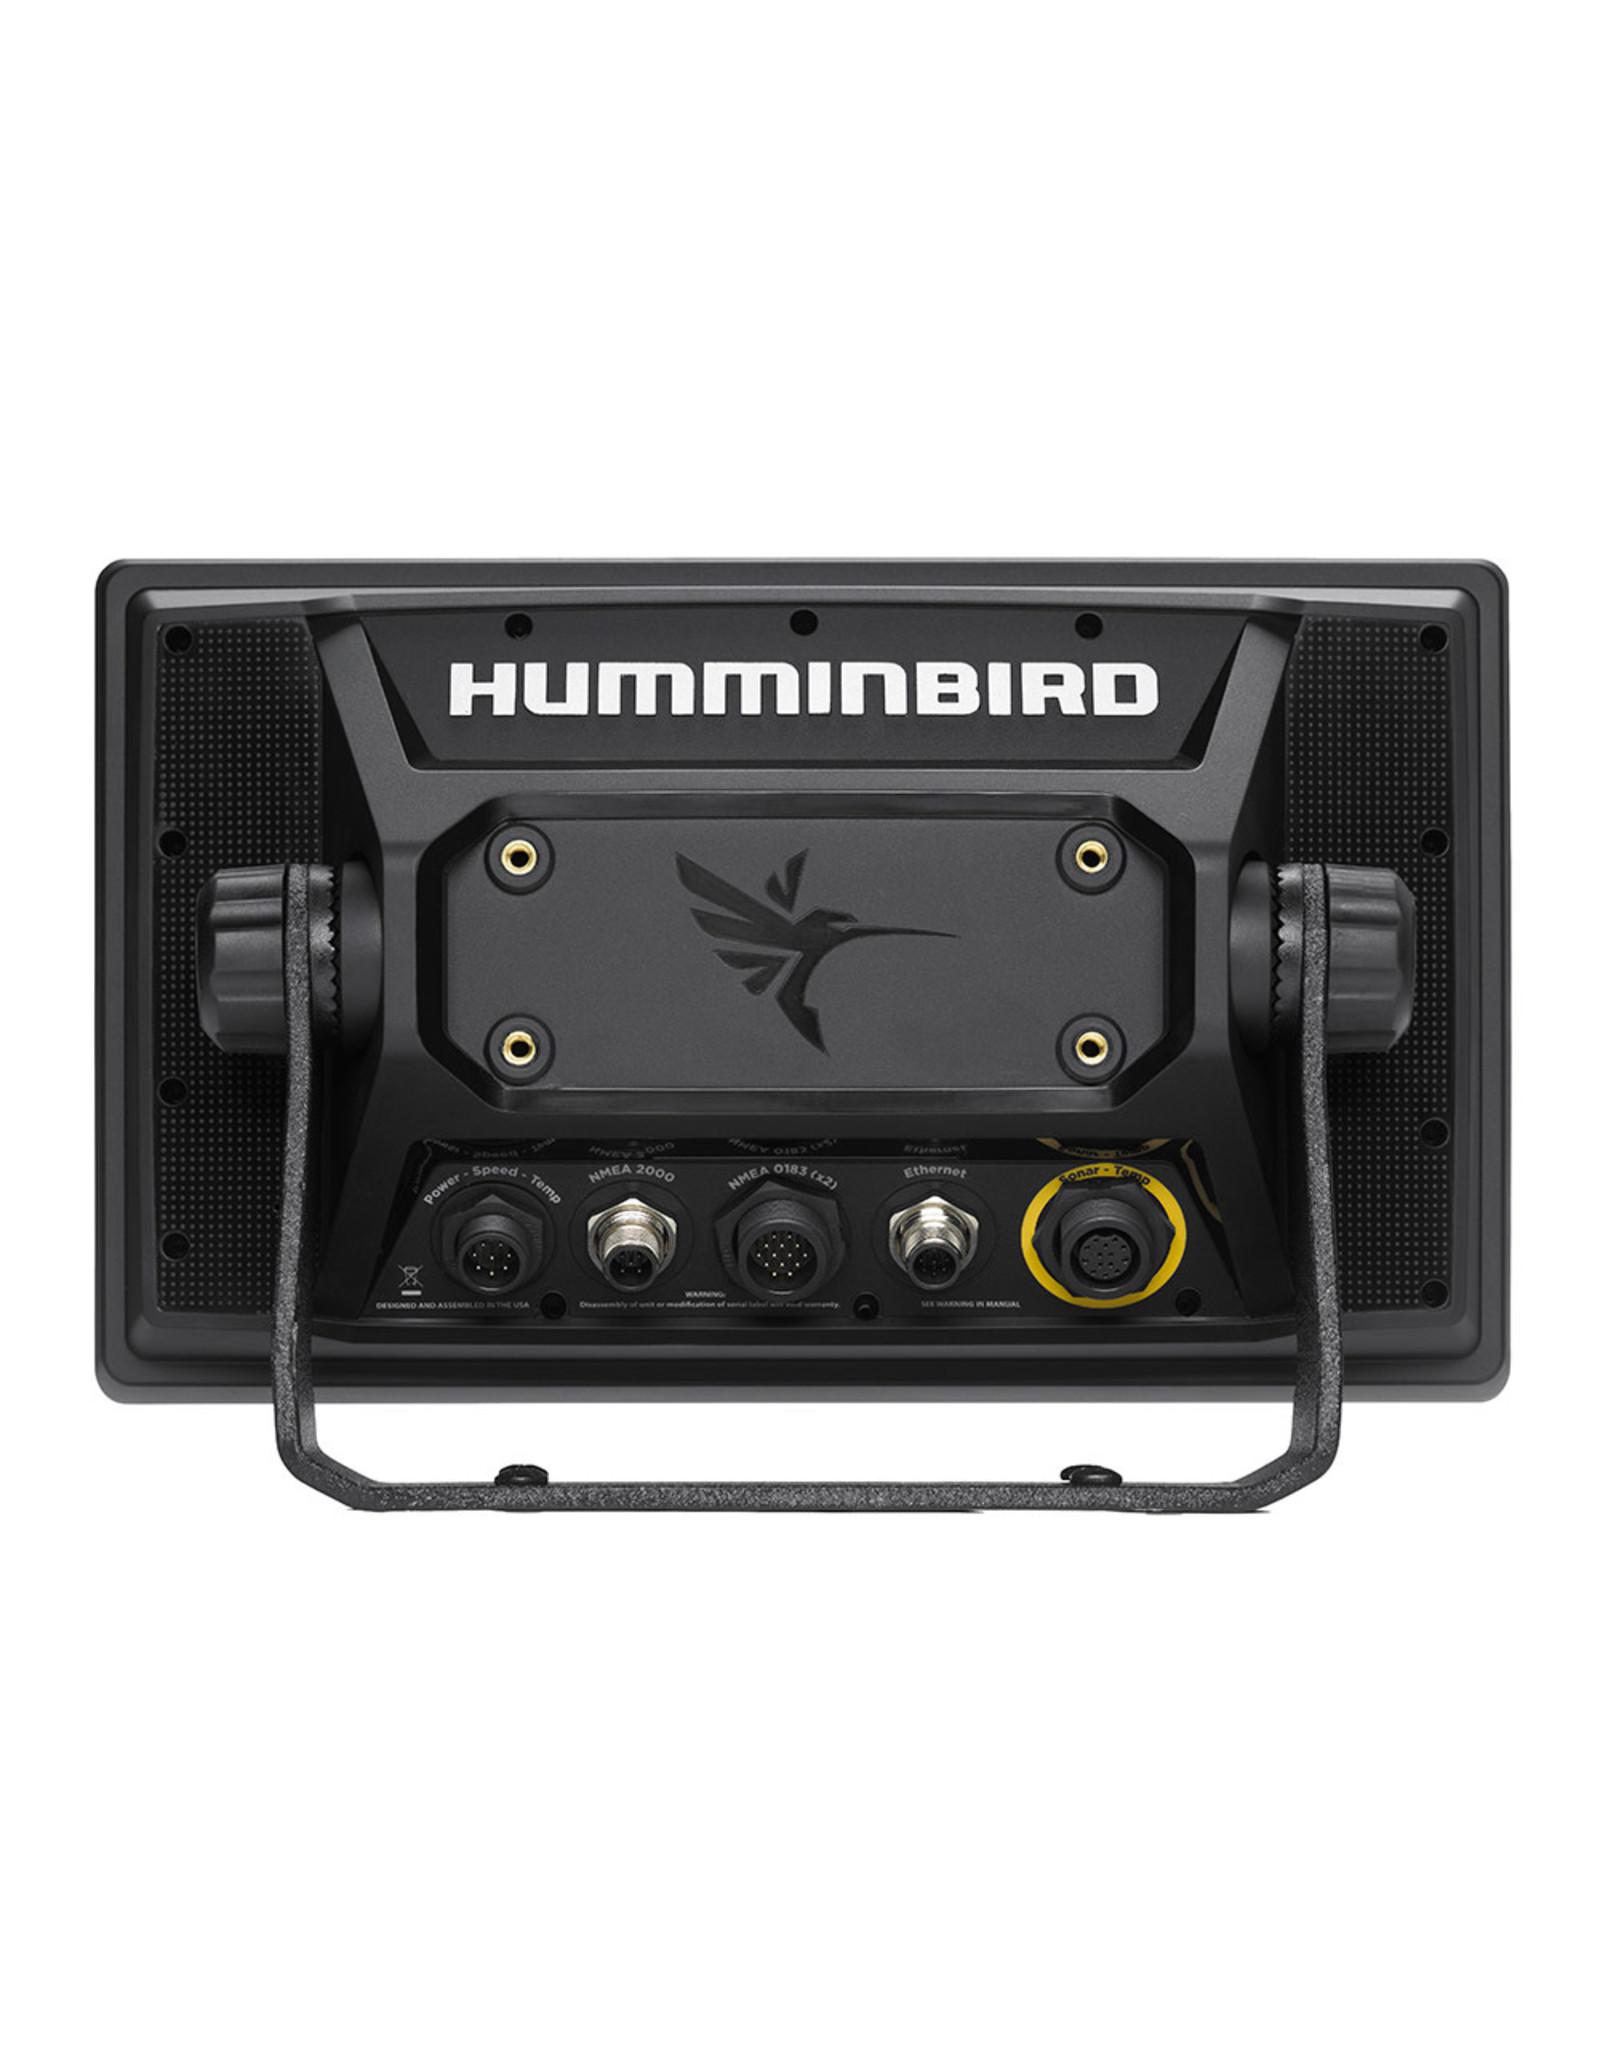 Humminbird SOLIX™ 10 CHIRP MEGA SI Fishfinder/GPS Combo G2 with Transom Mount Transducer